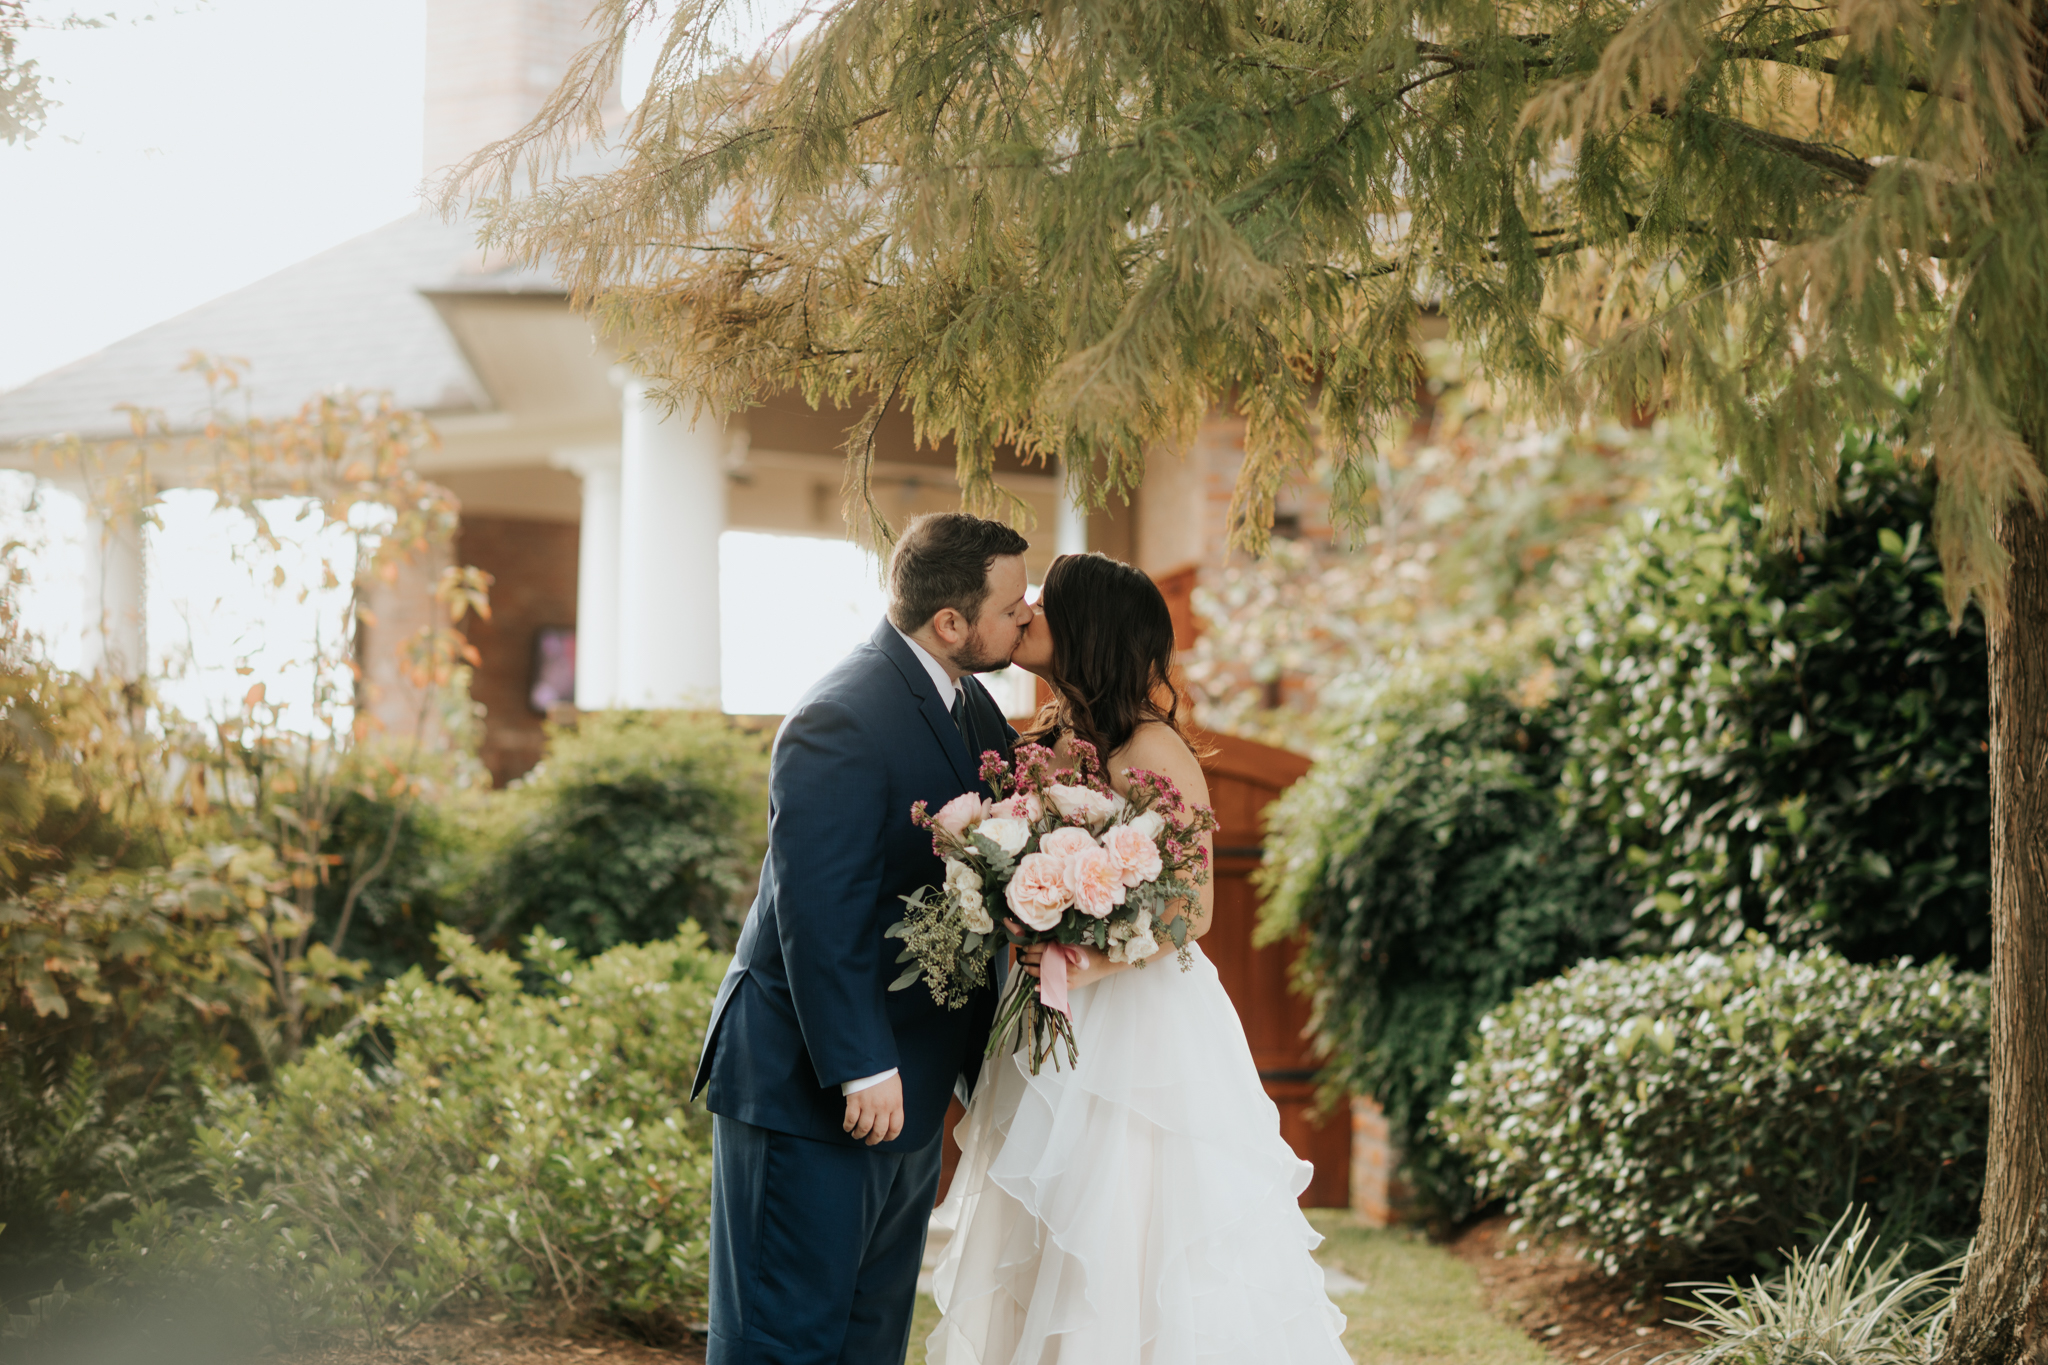 Leah Nicole Photography - Houston Wedding Photographer-Lake Conroe Wedding- Houston Wedding Photographer-12.jpg